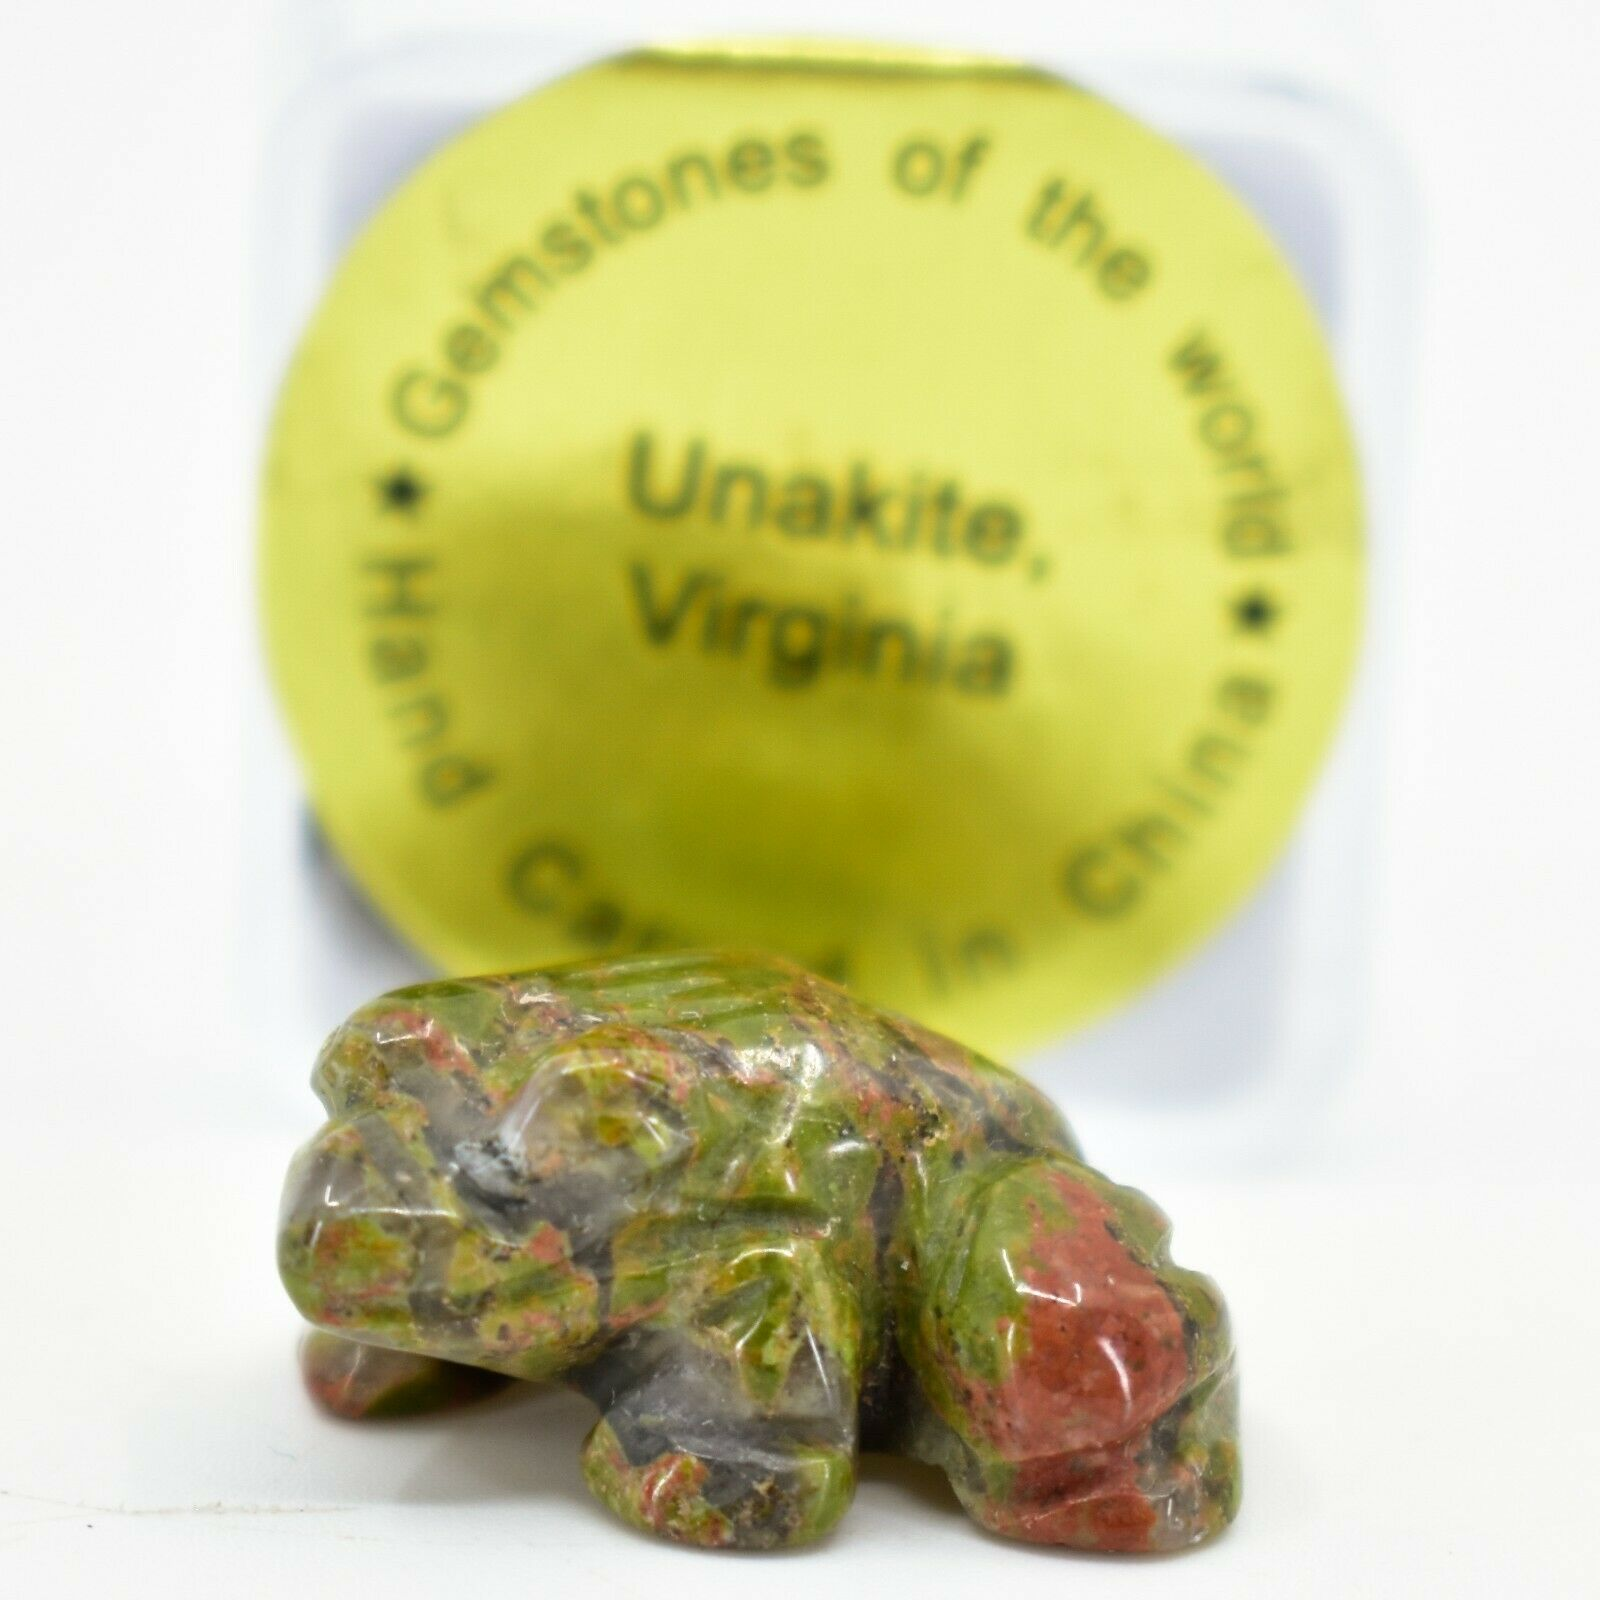 Unakite Jasper Gemstone Tiny Miniature Frog Figurine Hand Carved in China